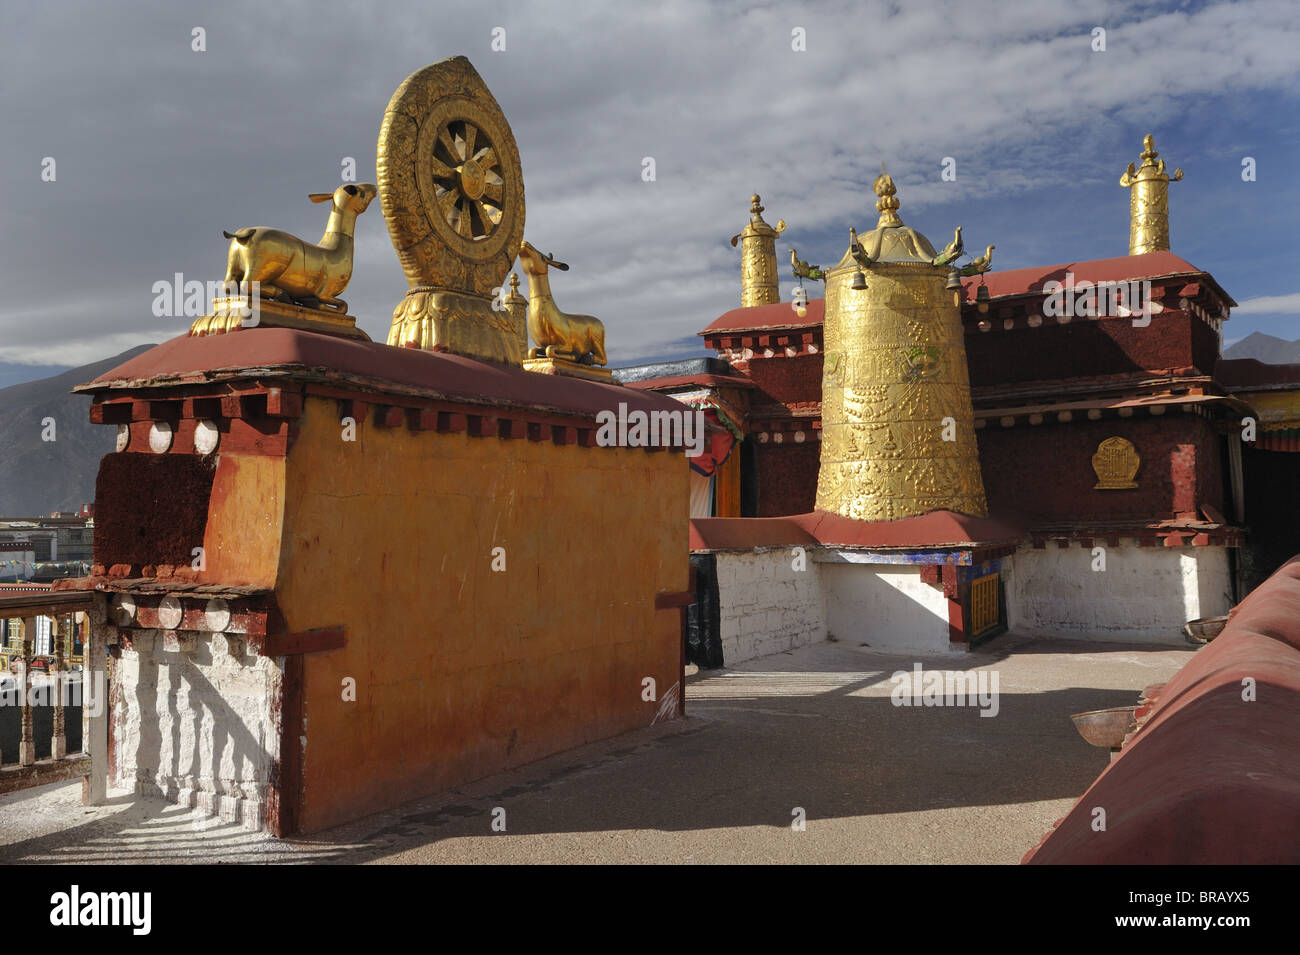 Dharma Wheel on roof of Jokhang Temple. Lhasa, Tibet. - Stock Image